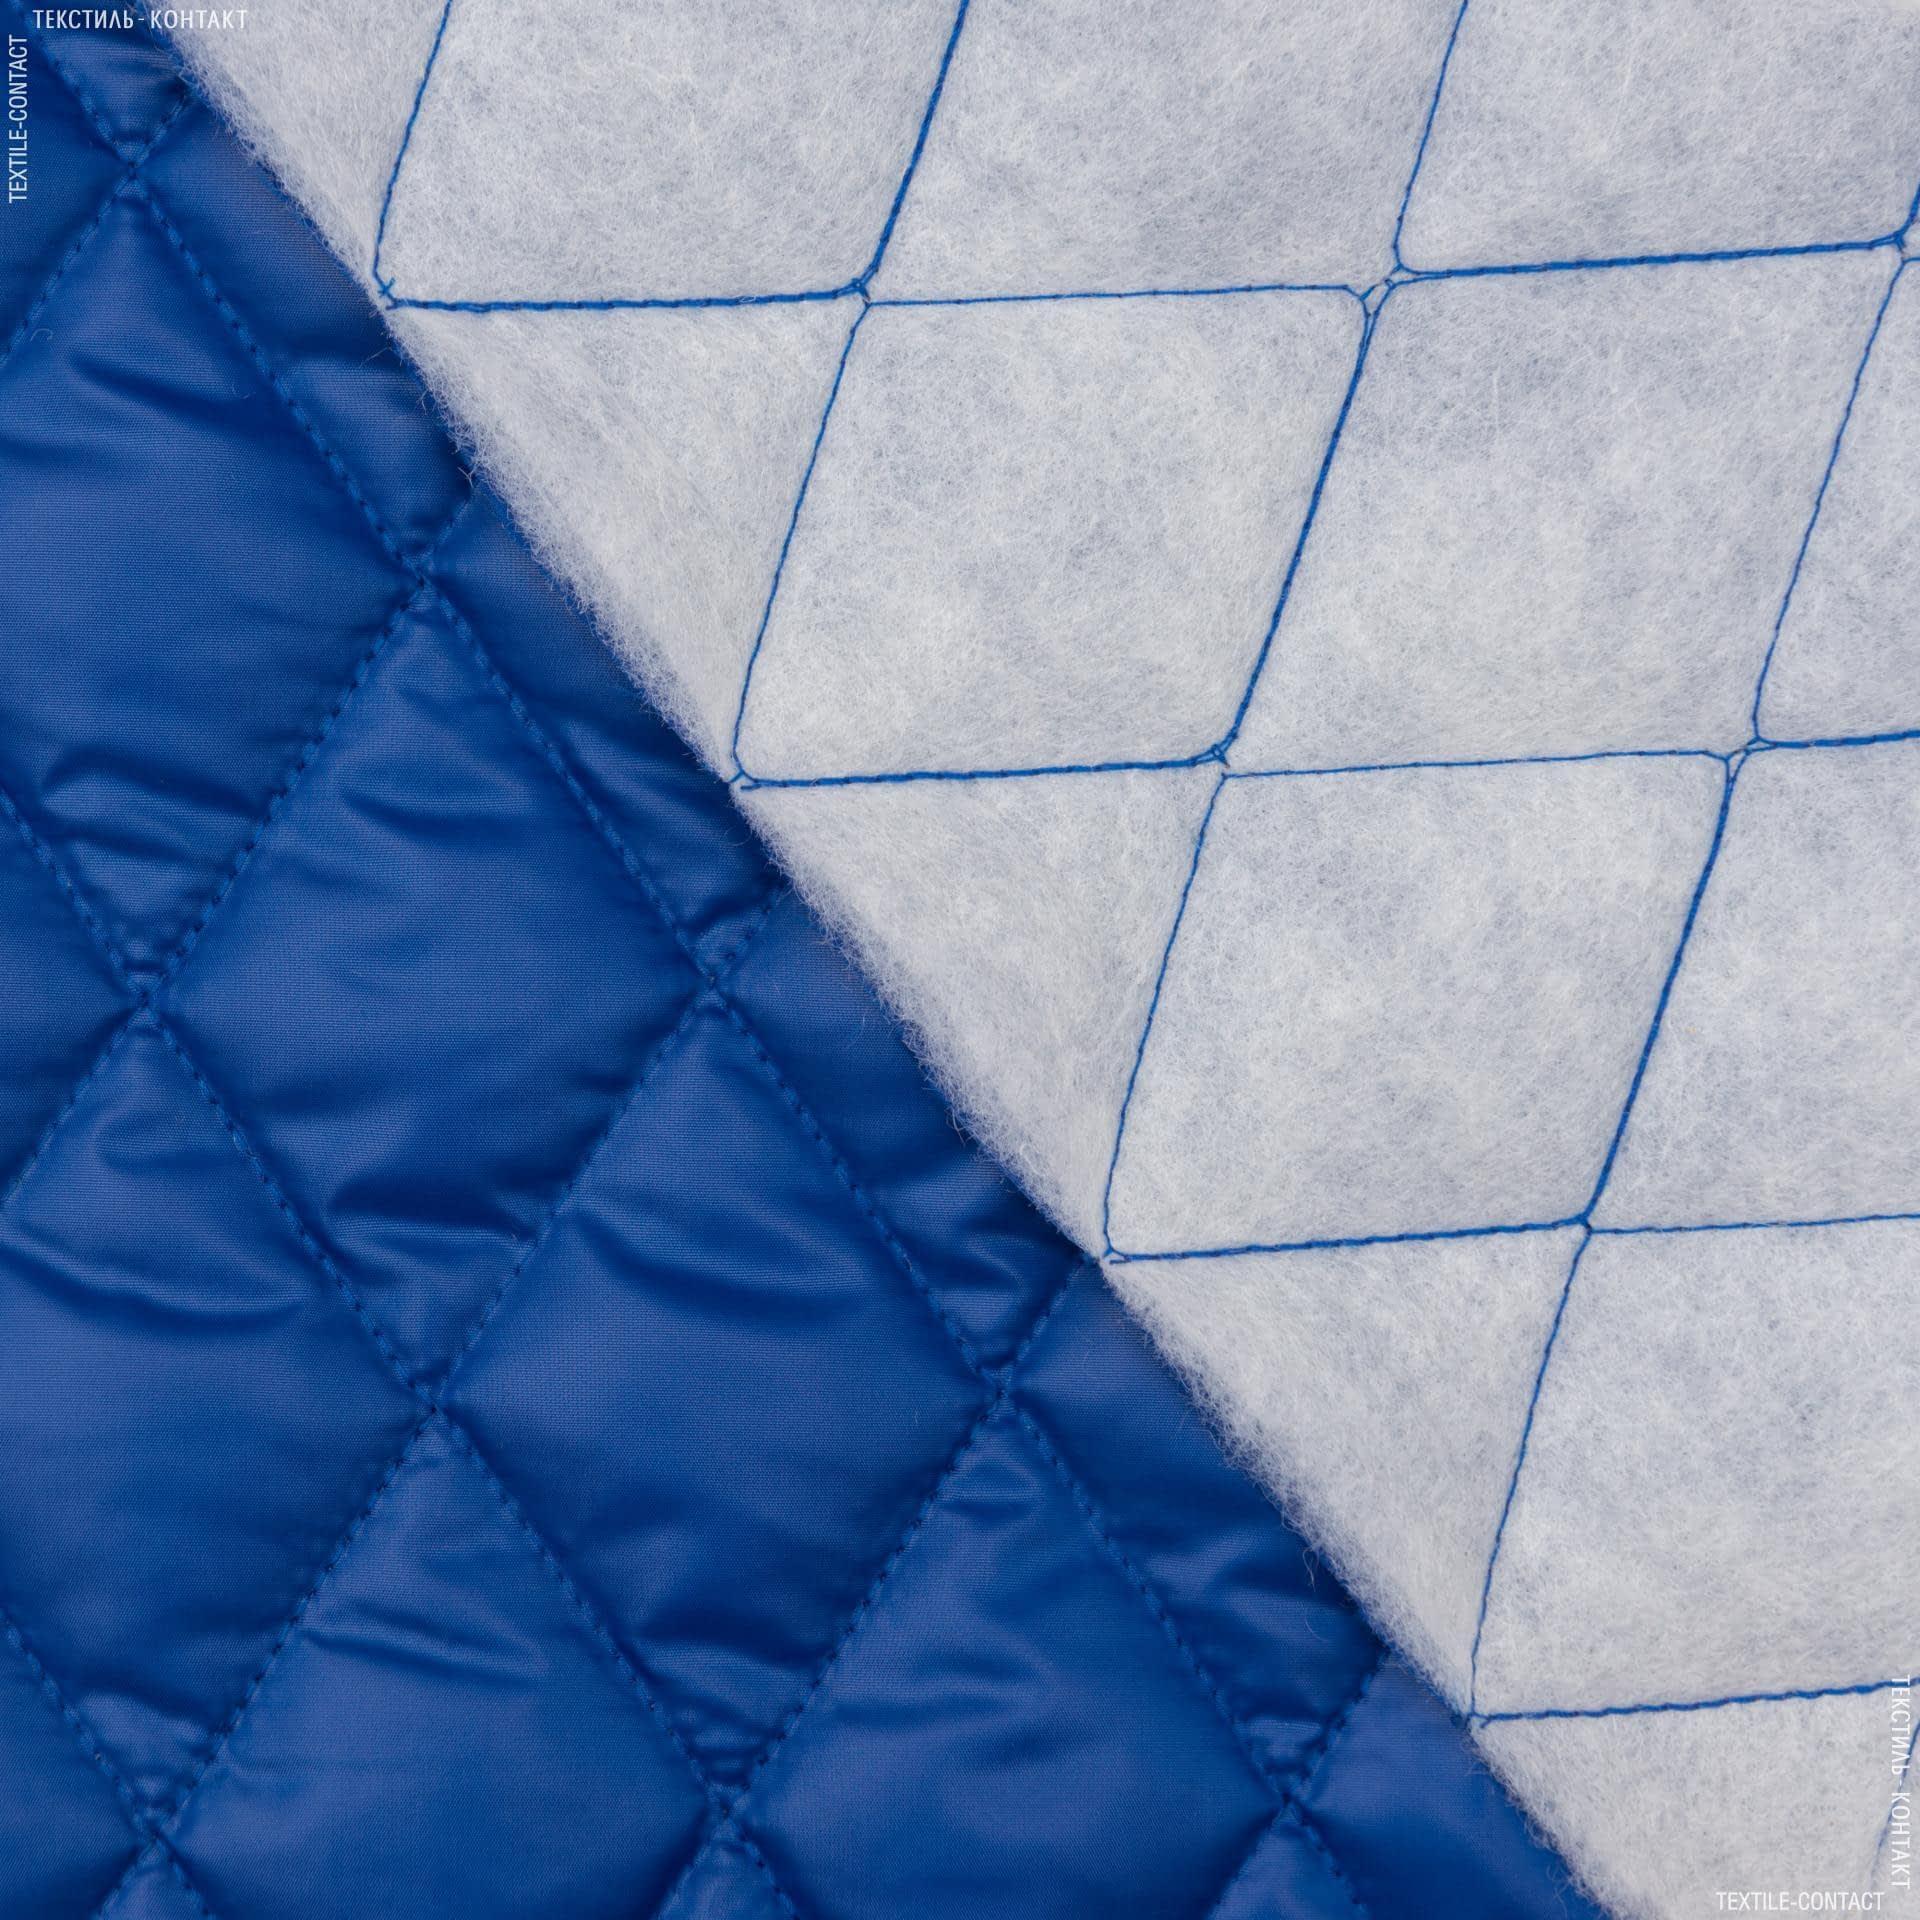 Тканини для верхнього одягу - Плащова рубі лаке стьобана з синтепоном електрик